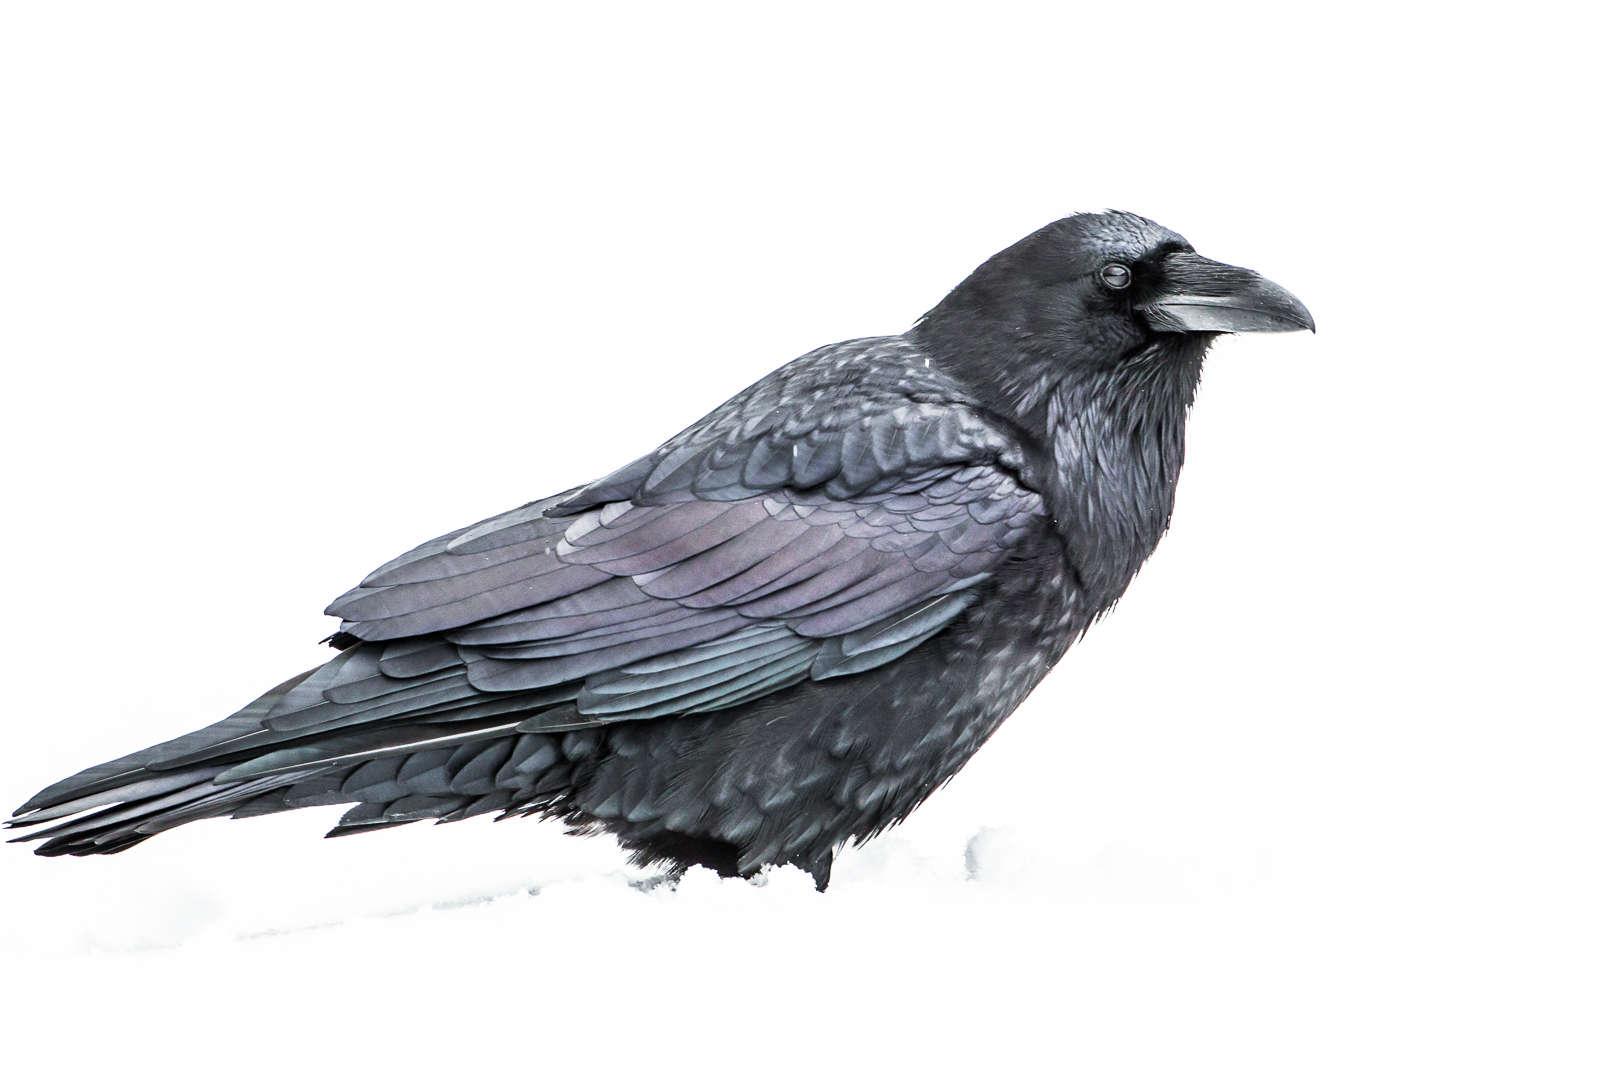 Drawn raven snow The Ravens Photography snow Martin